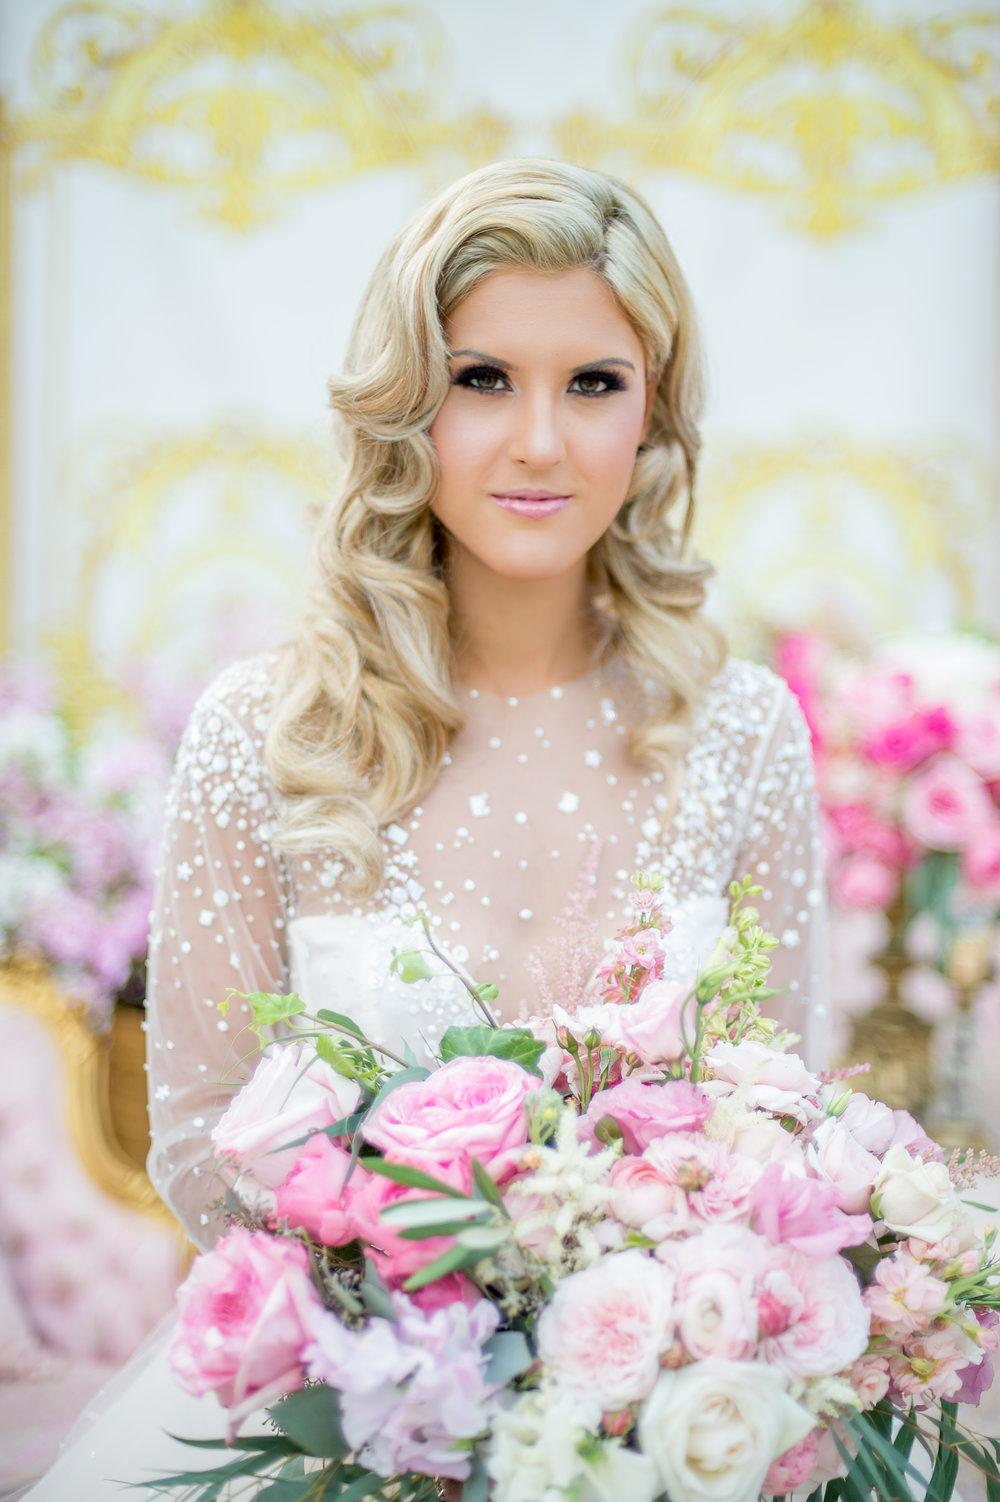 makeup-worx-mobile-wedding- makeup-hair-GTA-1.jpg